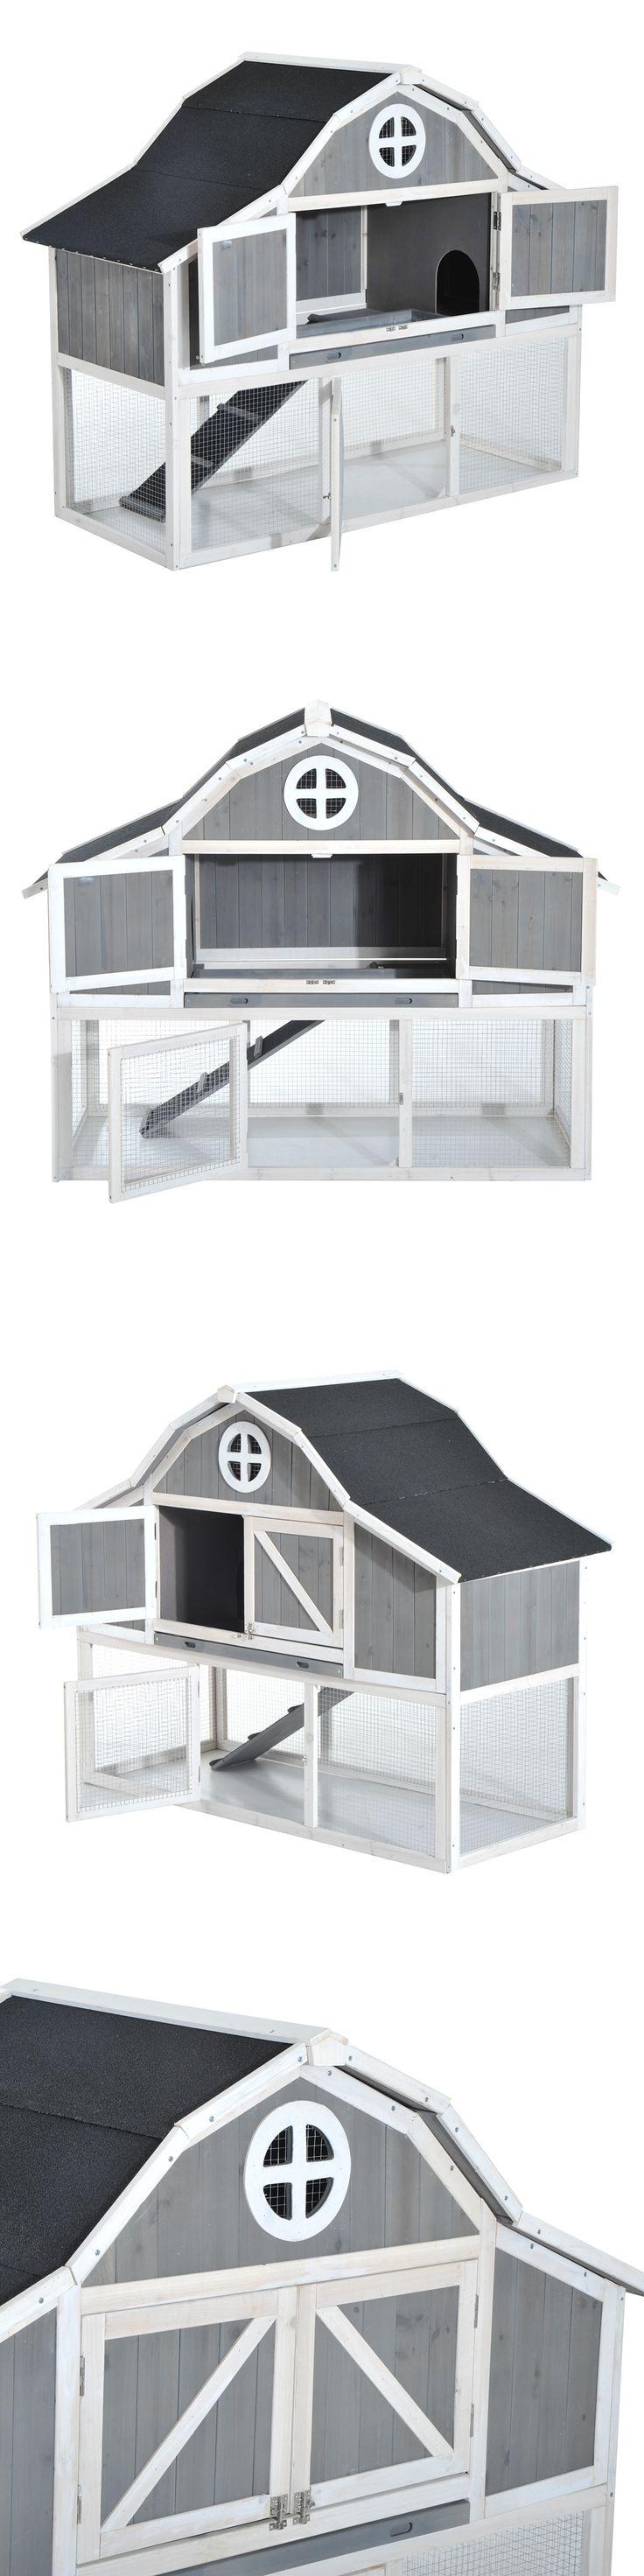 backyard poultry supplies 177801 pawhut 59 wooden chicken coop